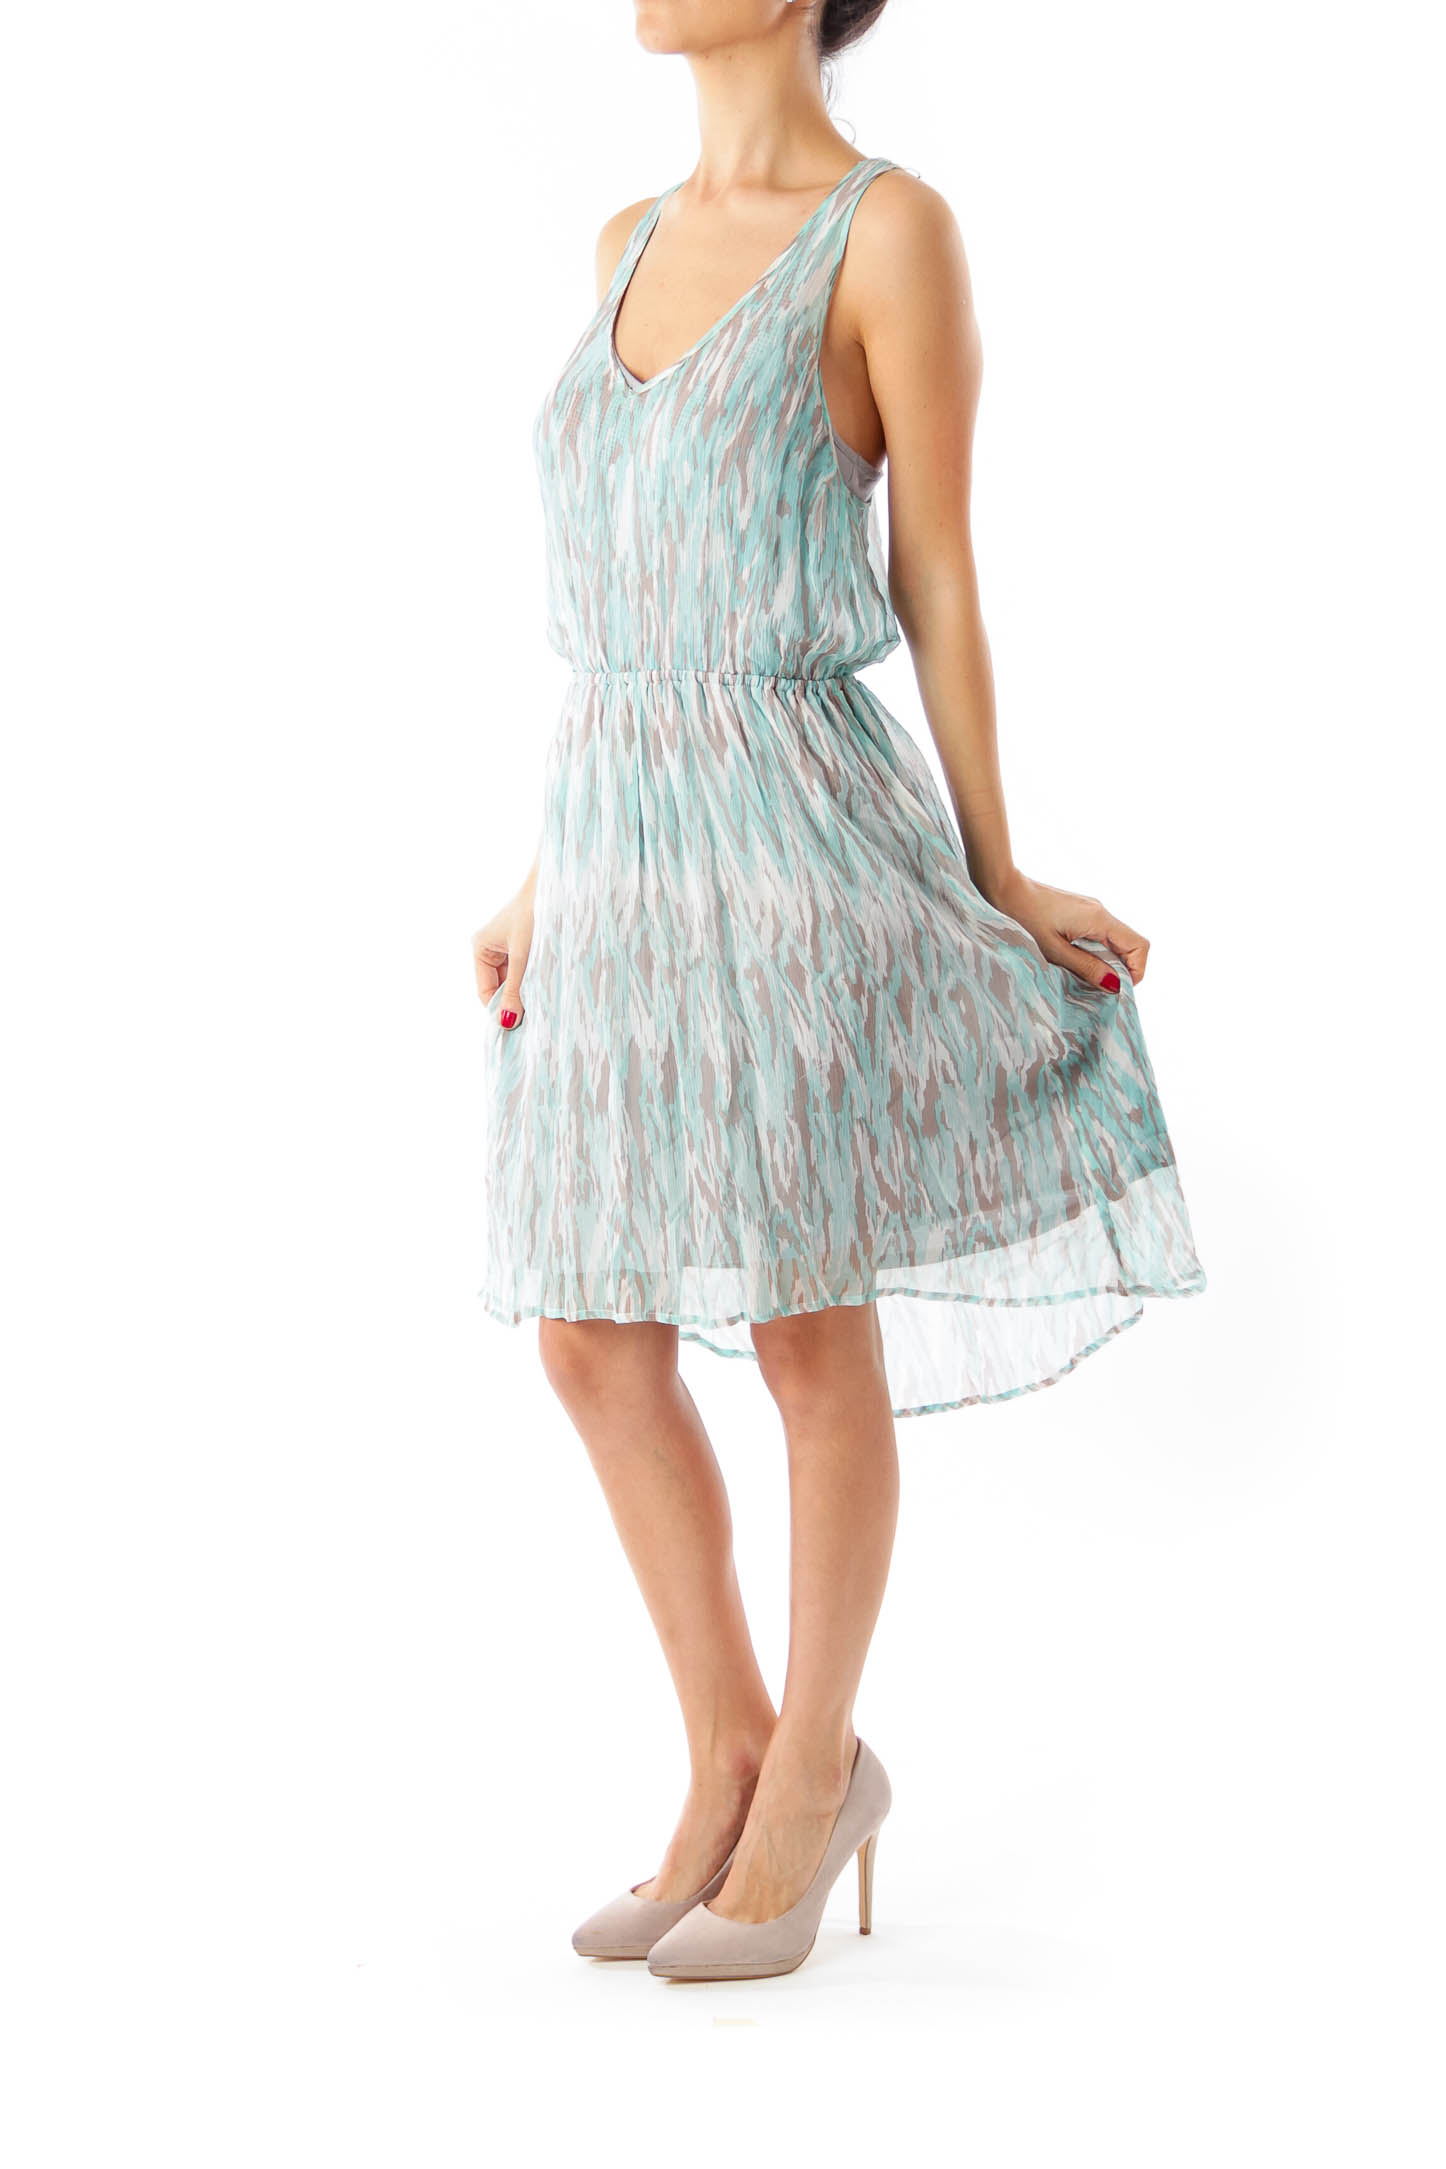 Turquoise Gray Sleeveless Dress